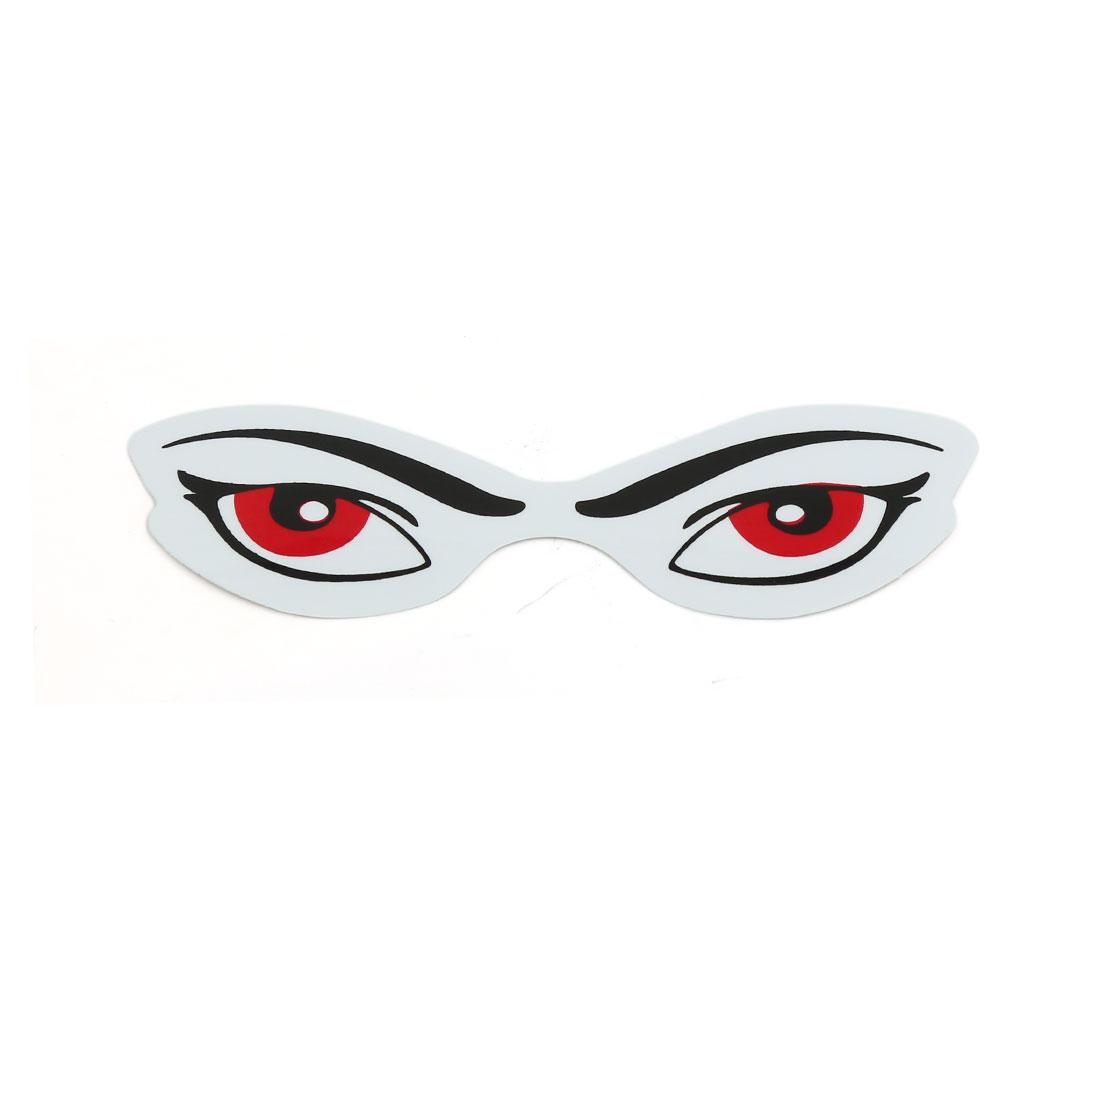 Red Black Eyes Pattern Sticky Car Window Sticker Decal Decor 4.5x1.4 inch 10 Pcs